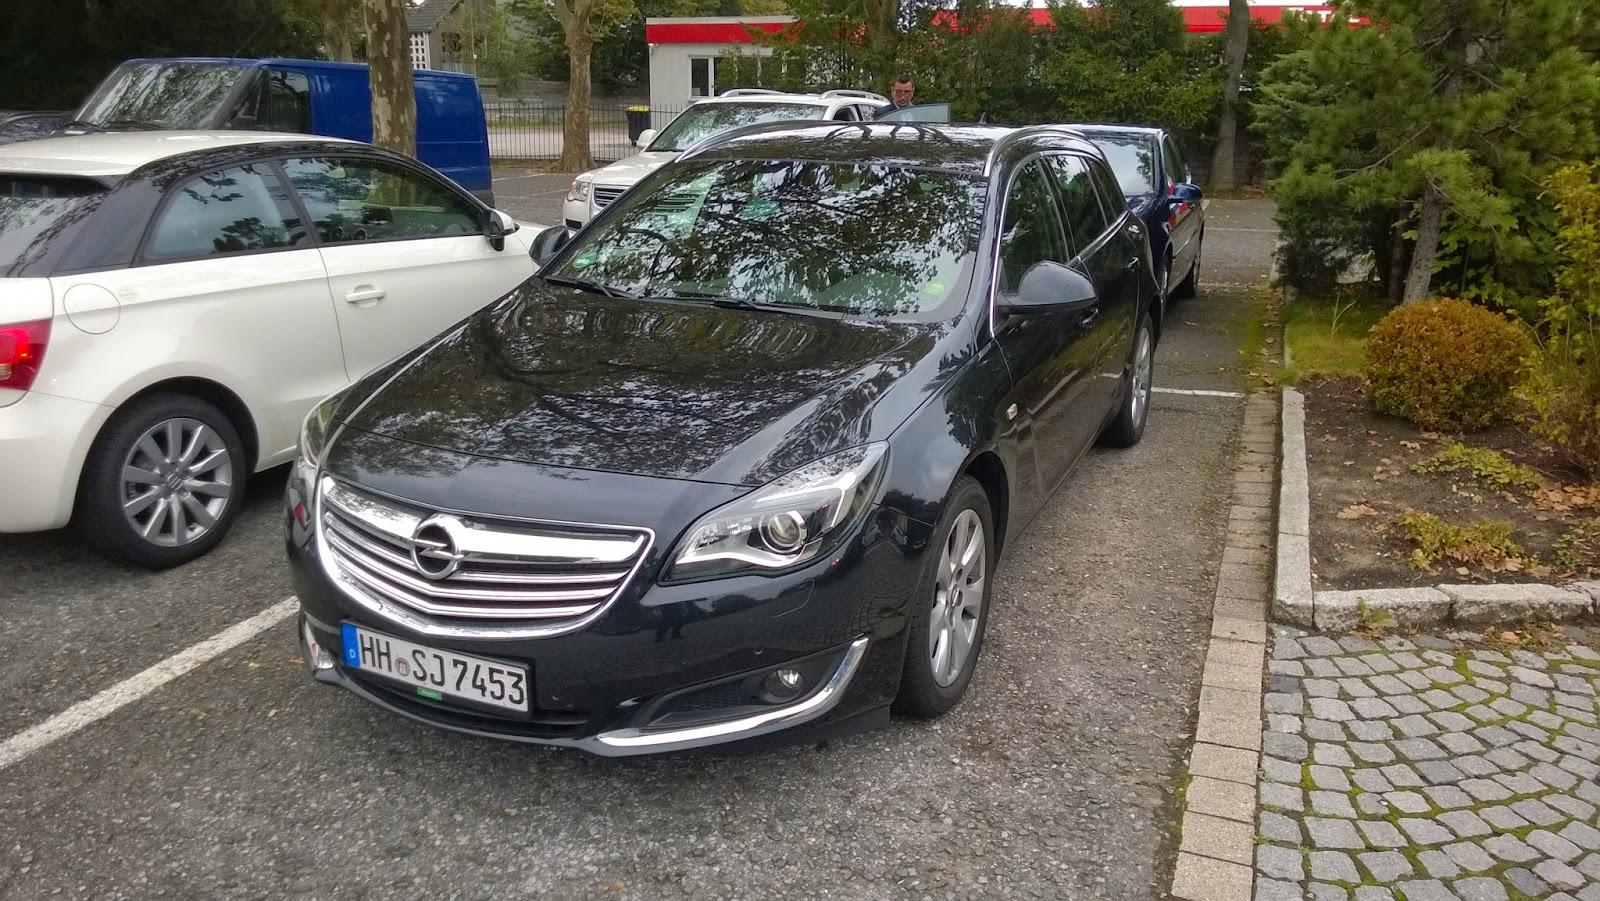 opel insignia sports tourer 2.0 cdti - duck@cars